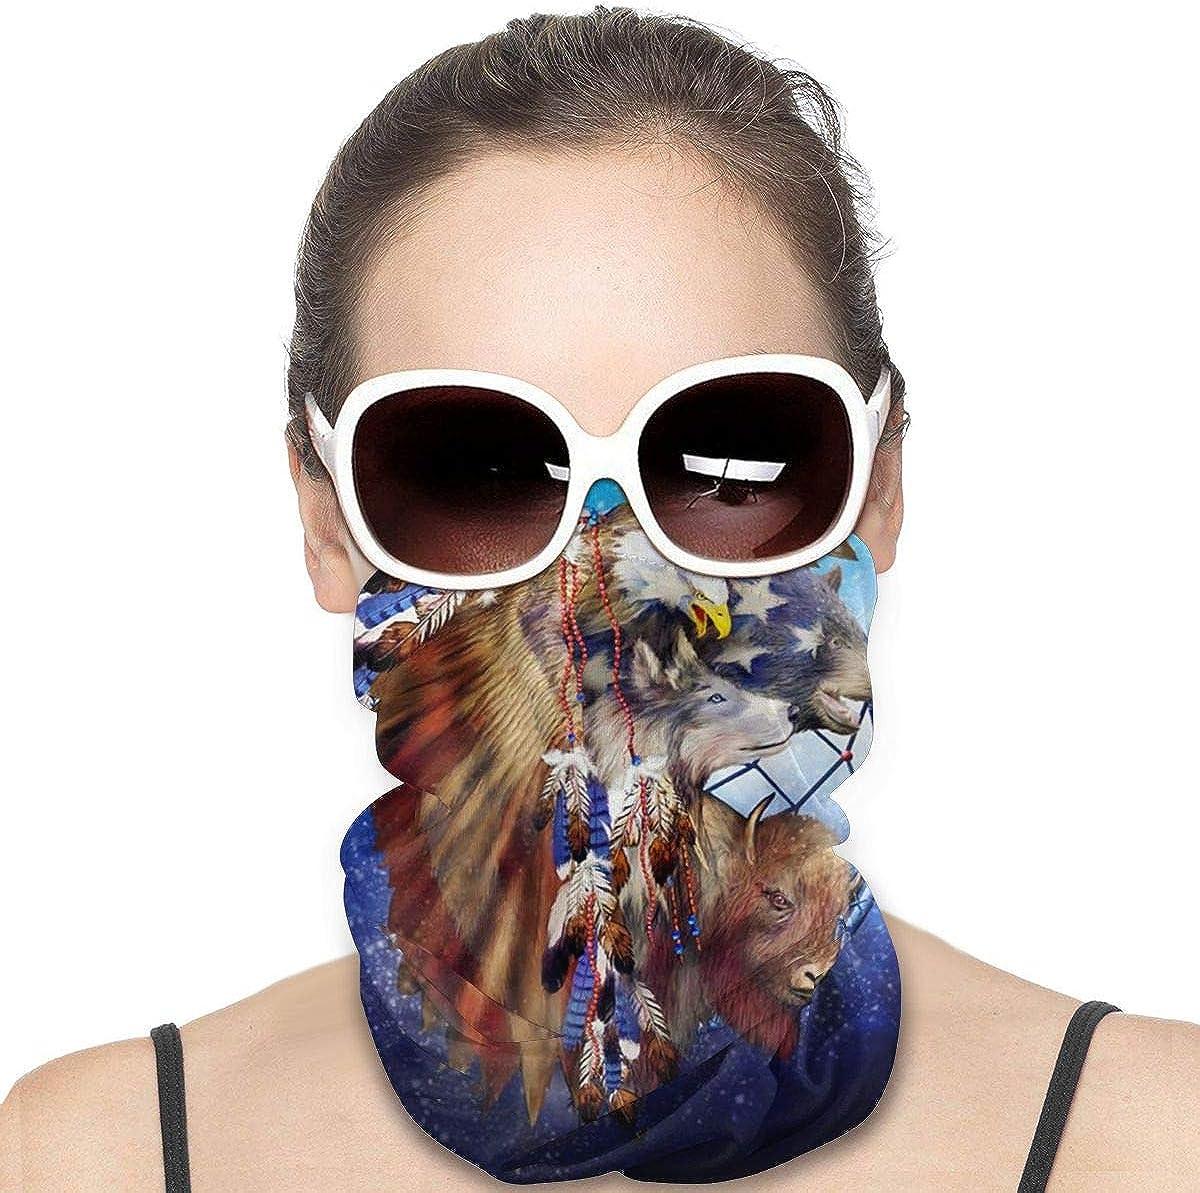 Tidyki Bandana Face Mask - Happy Camper Motorcycle Mask Neck Gaiter Multifunctional Headwear Head Bands Neck Gaiters for Men Headbands Neck Warmer for Men